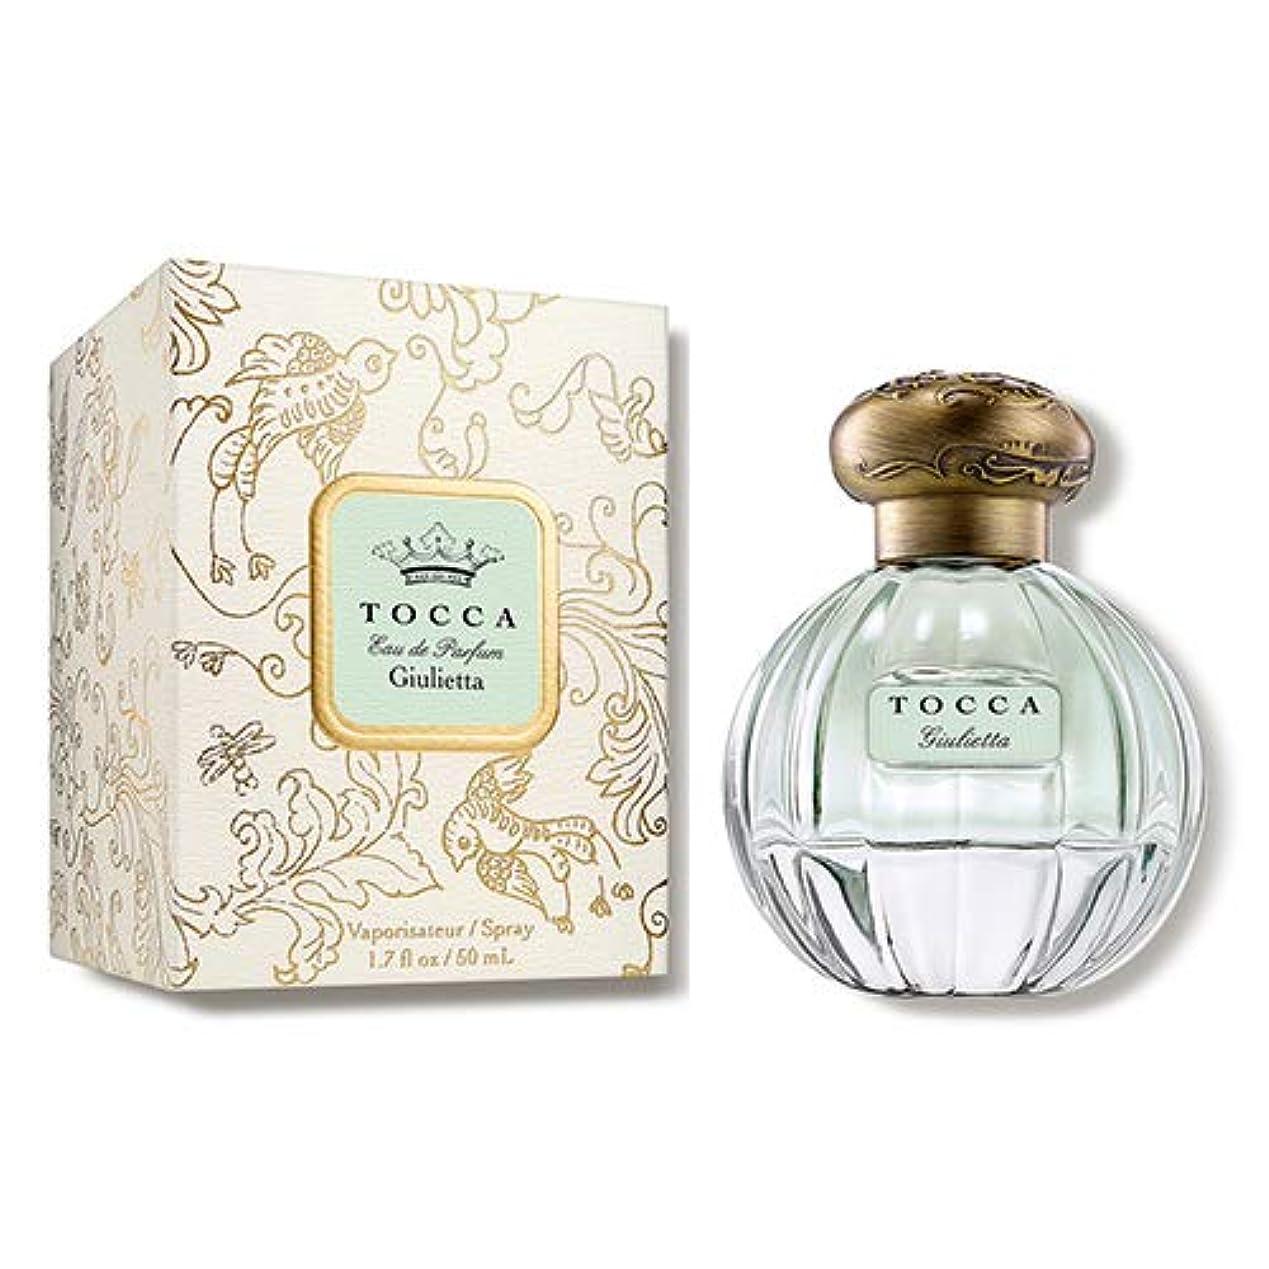 TOCCA トッカ ジュリエッタ オードパルファム 50ml ジュリエッタの香り(Giulietta) [並行輸入品]